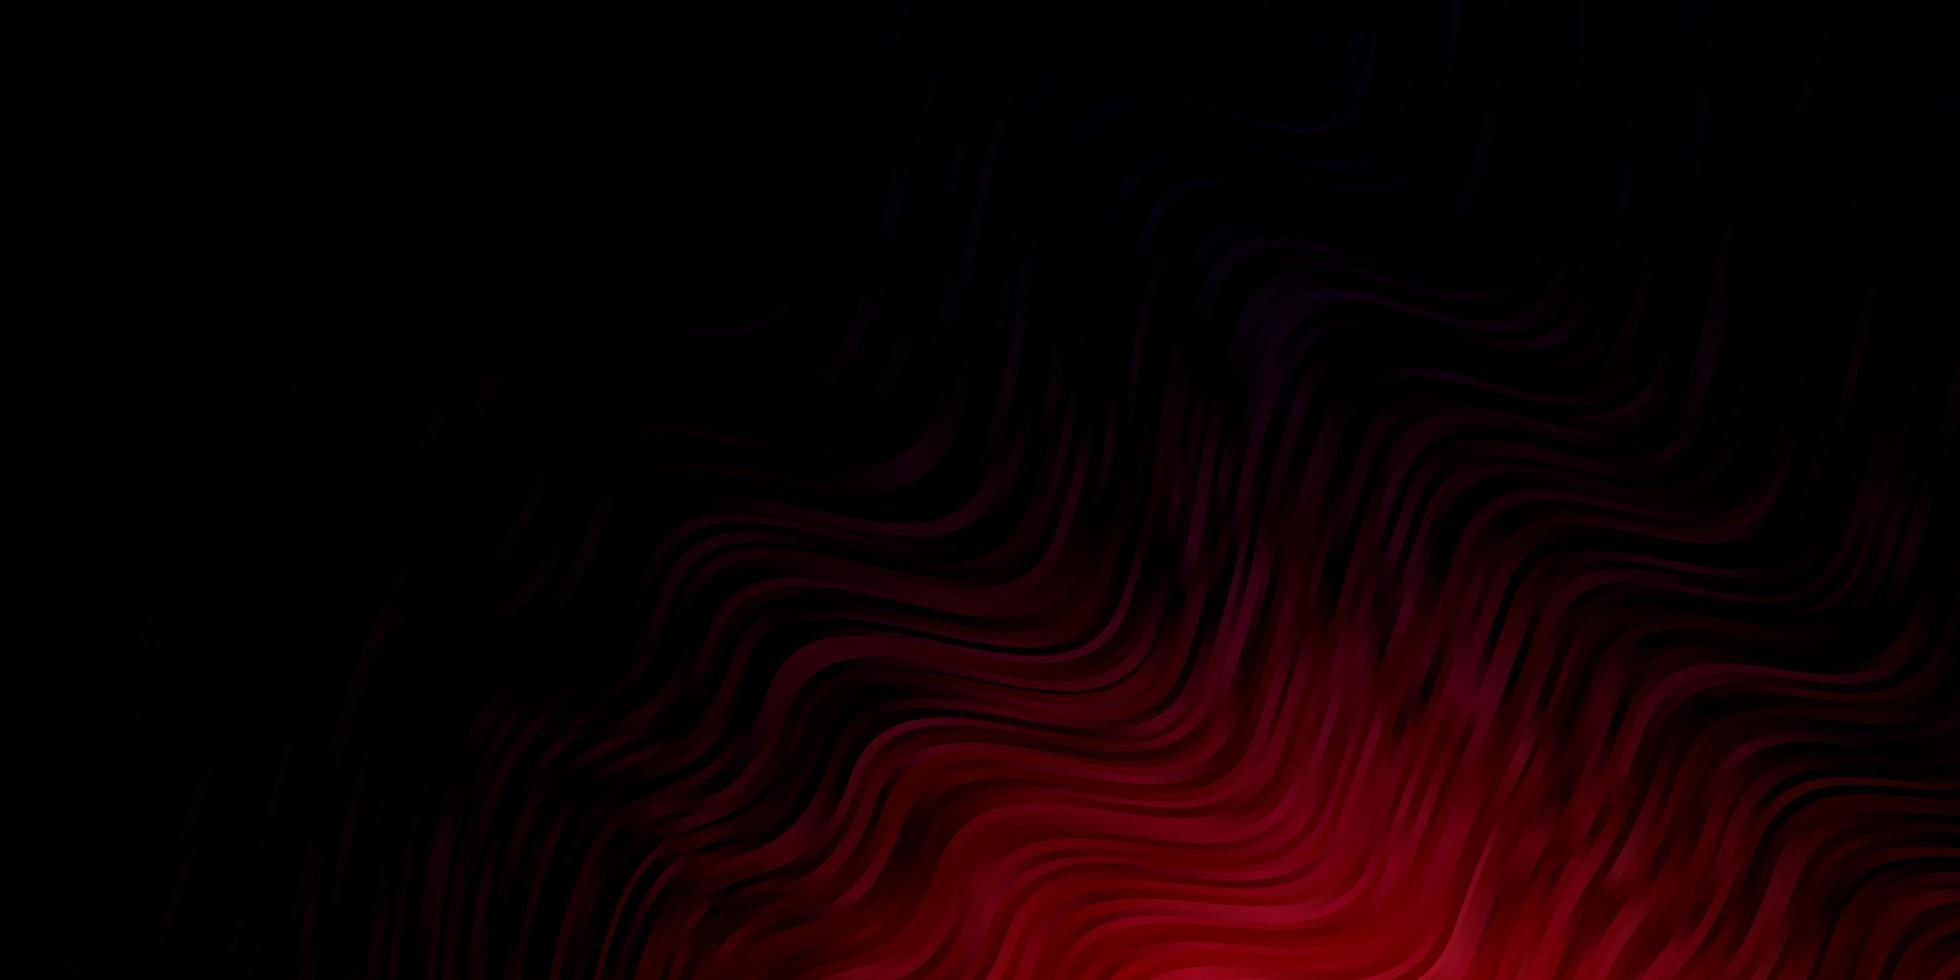 patrón rojo oscuro con líneas torcidas. vector